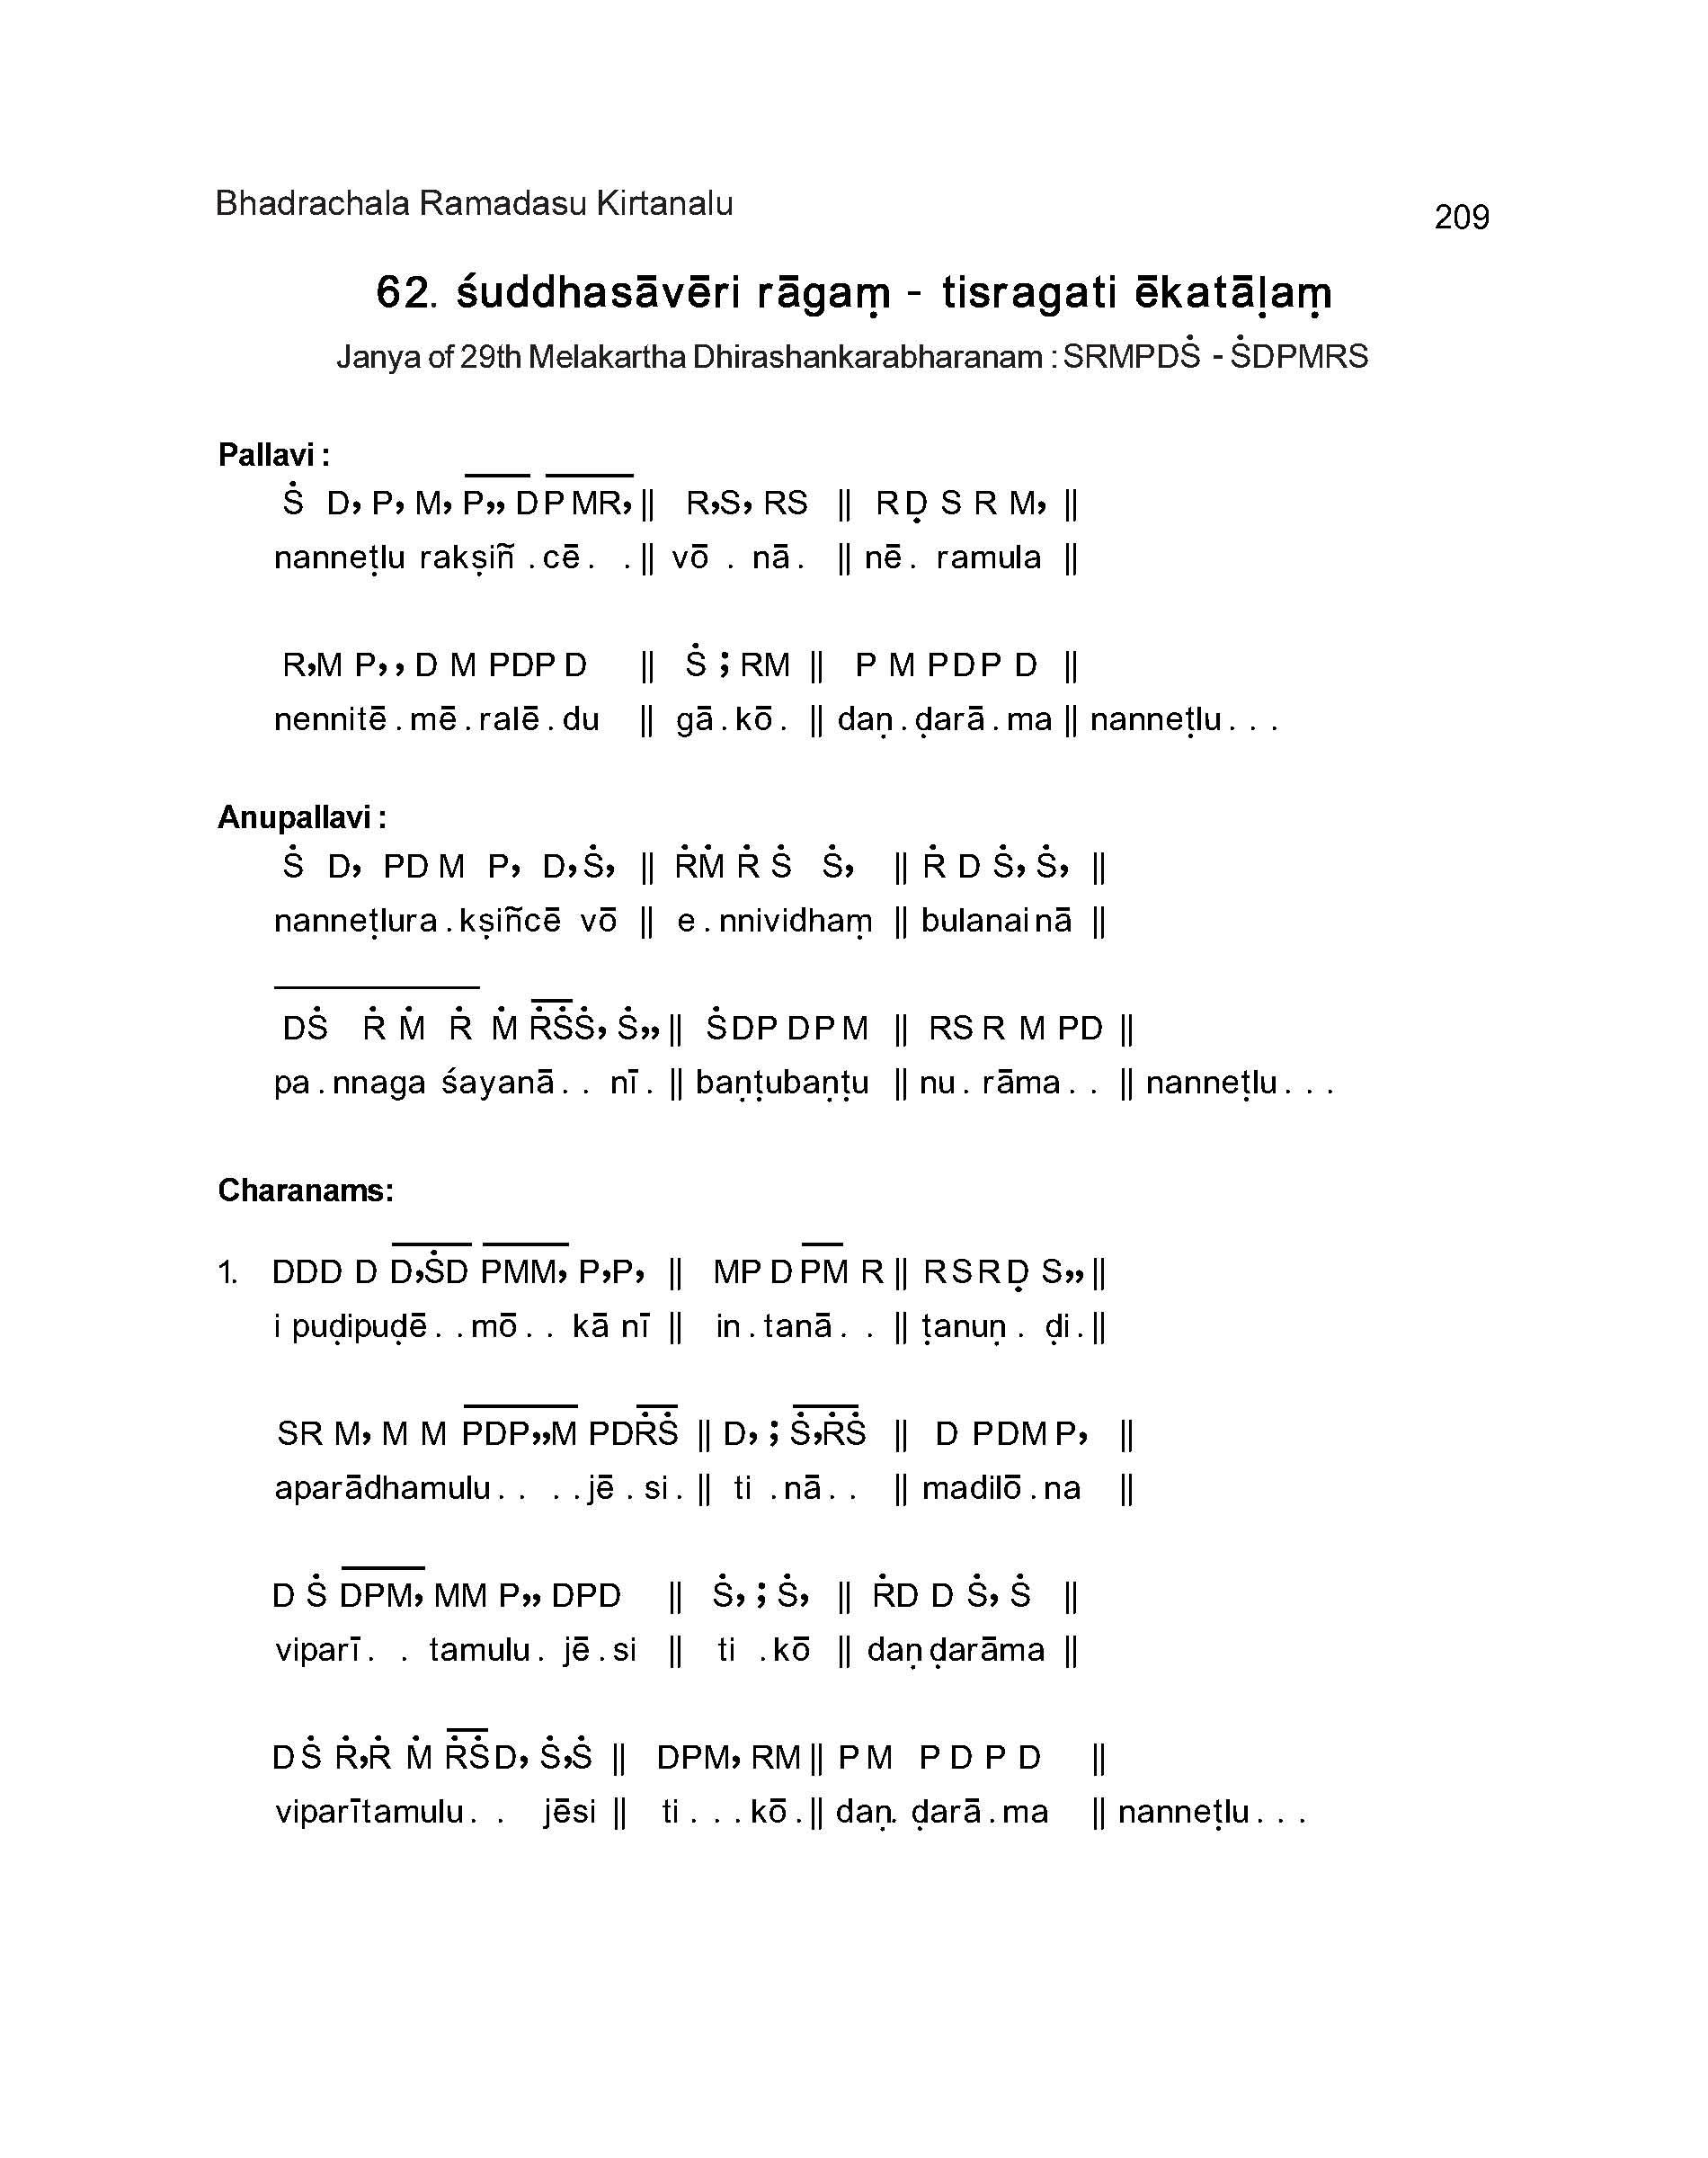 suddhasaveri ragam tisragati ekatalam, bhadrachala ramadasu keertanalu